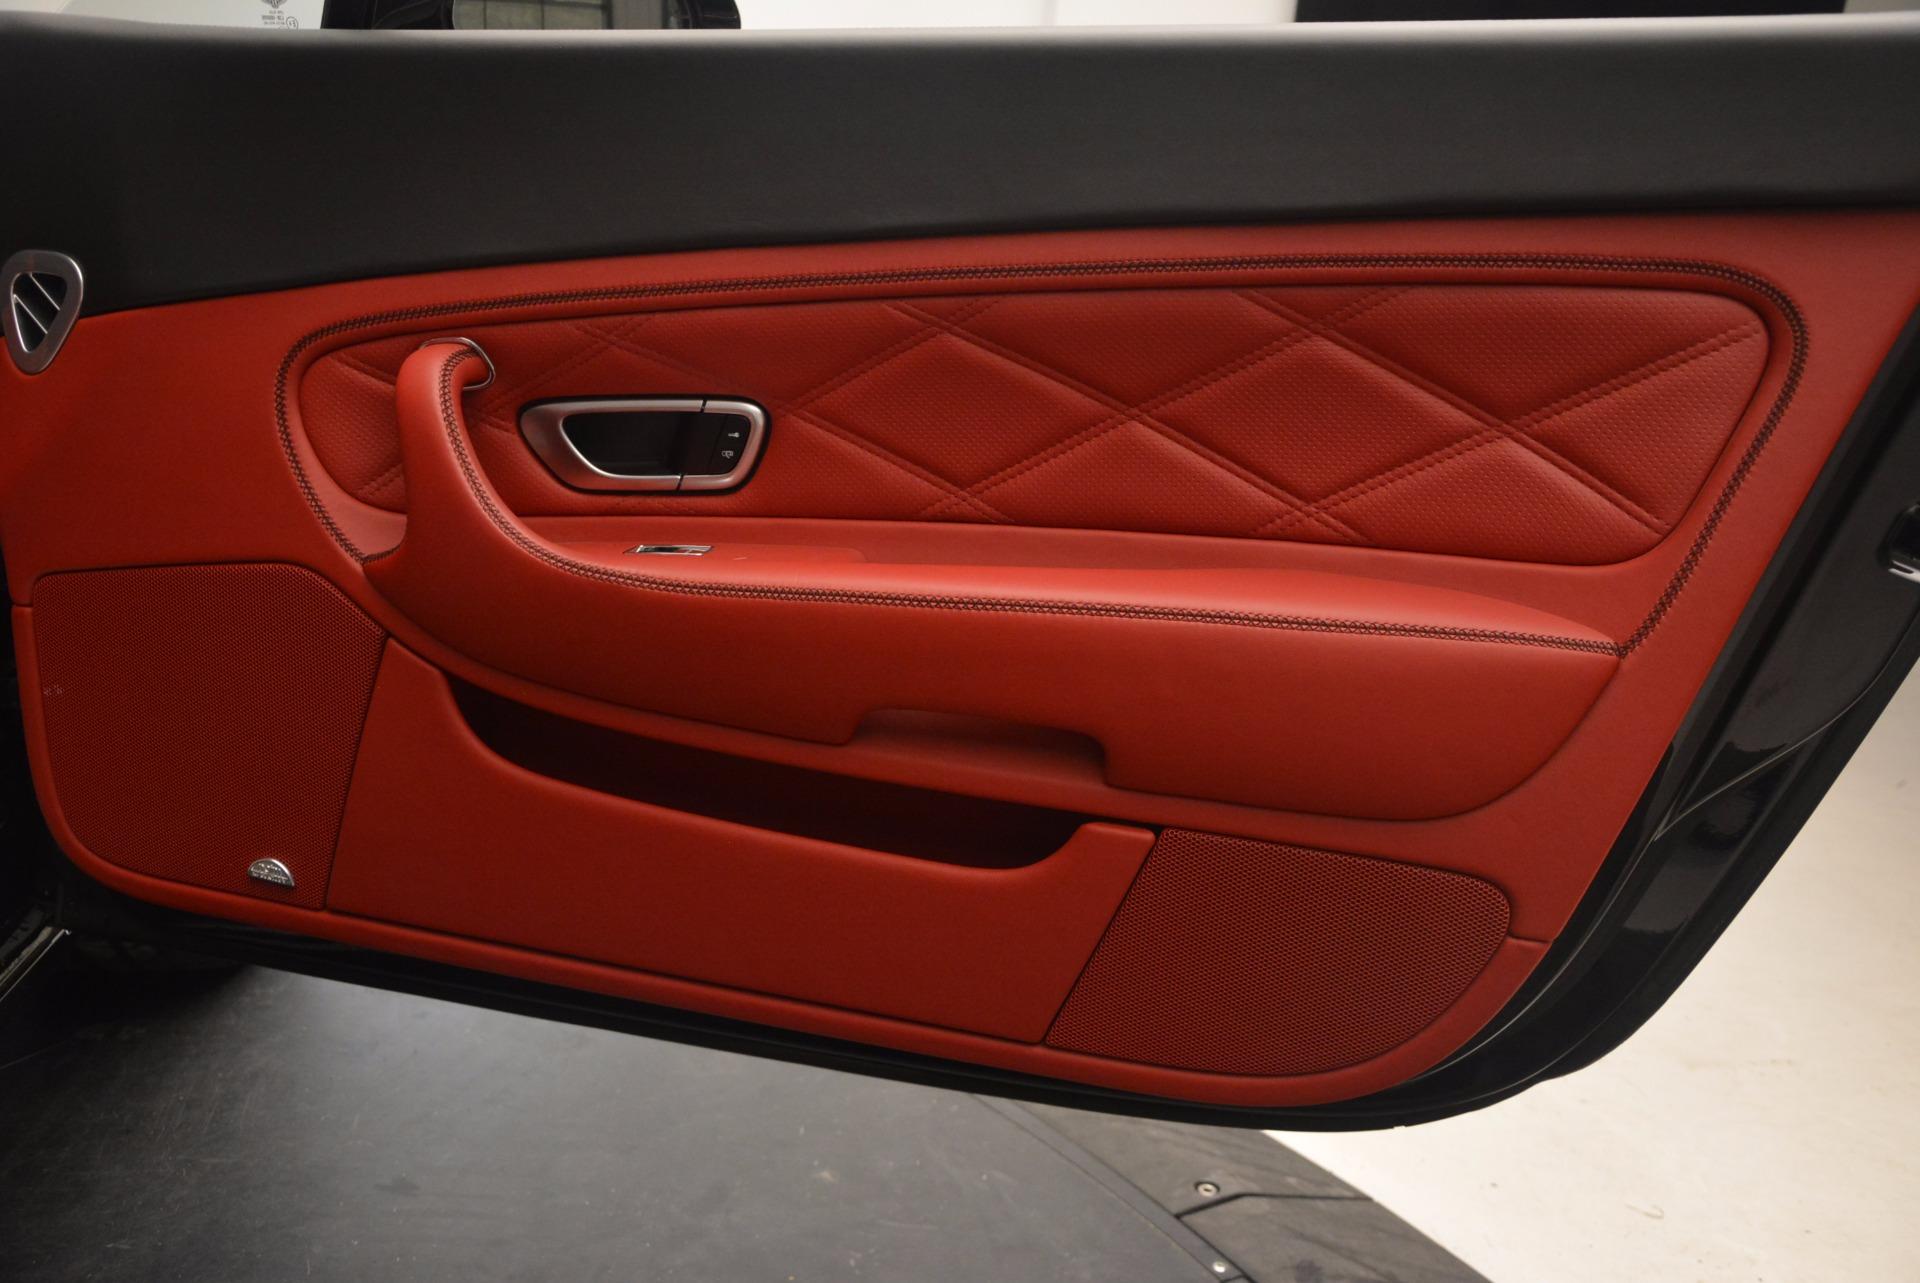 Used 2010 Bentley Continental GT Speed For Sale In Westport, CT 1298_p39